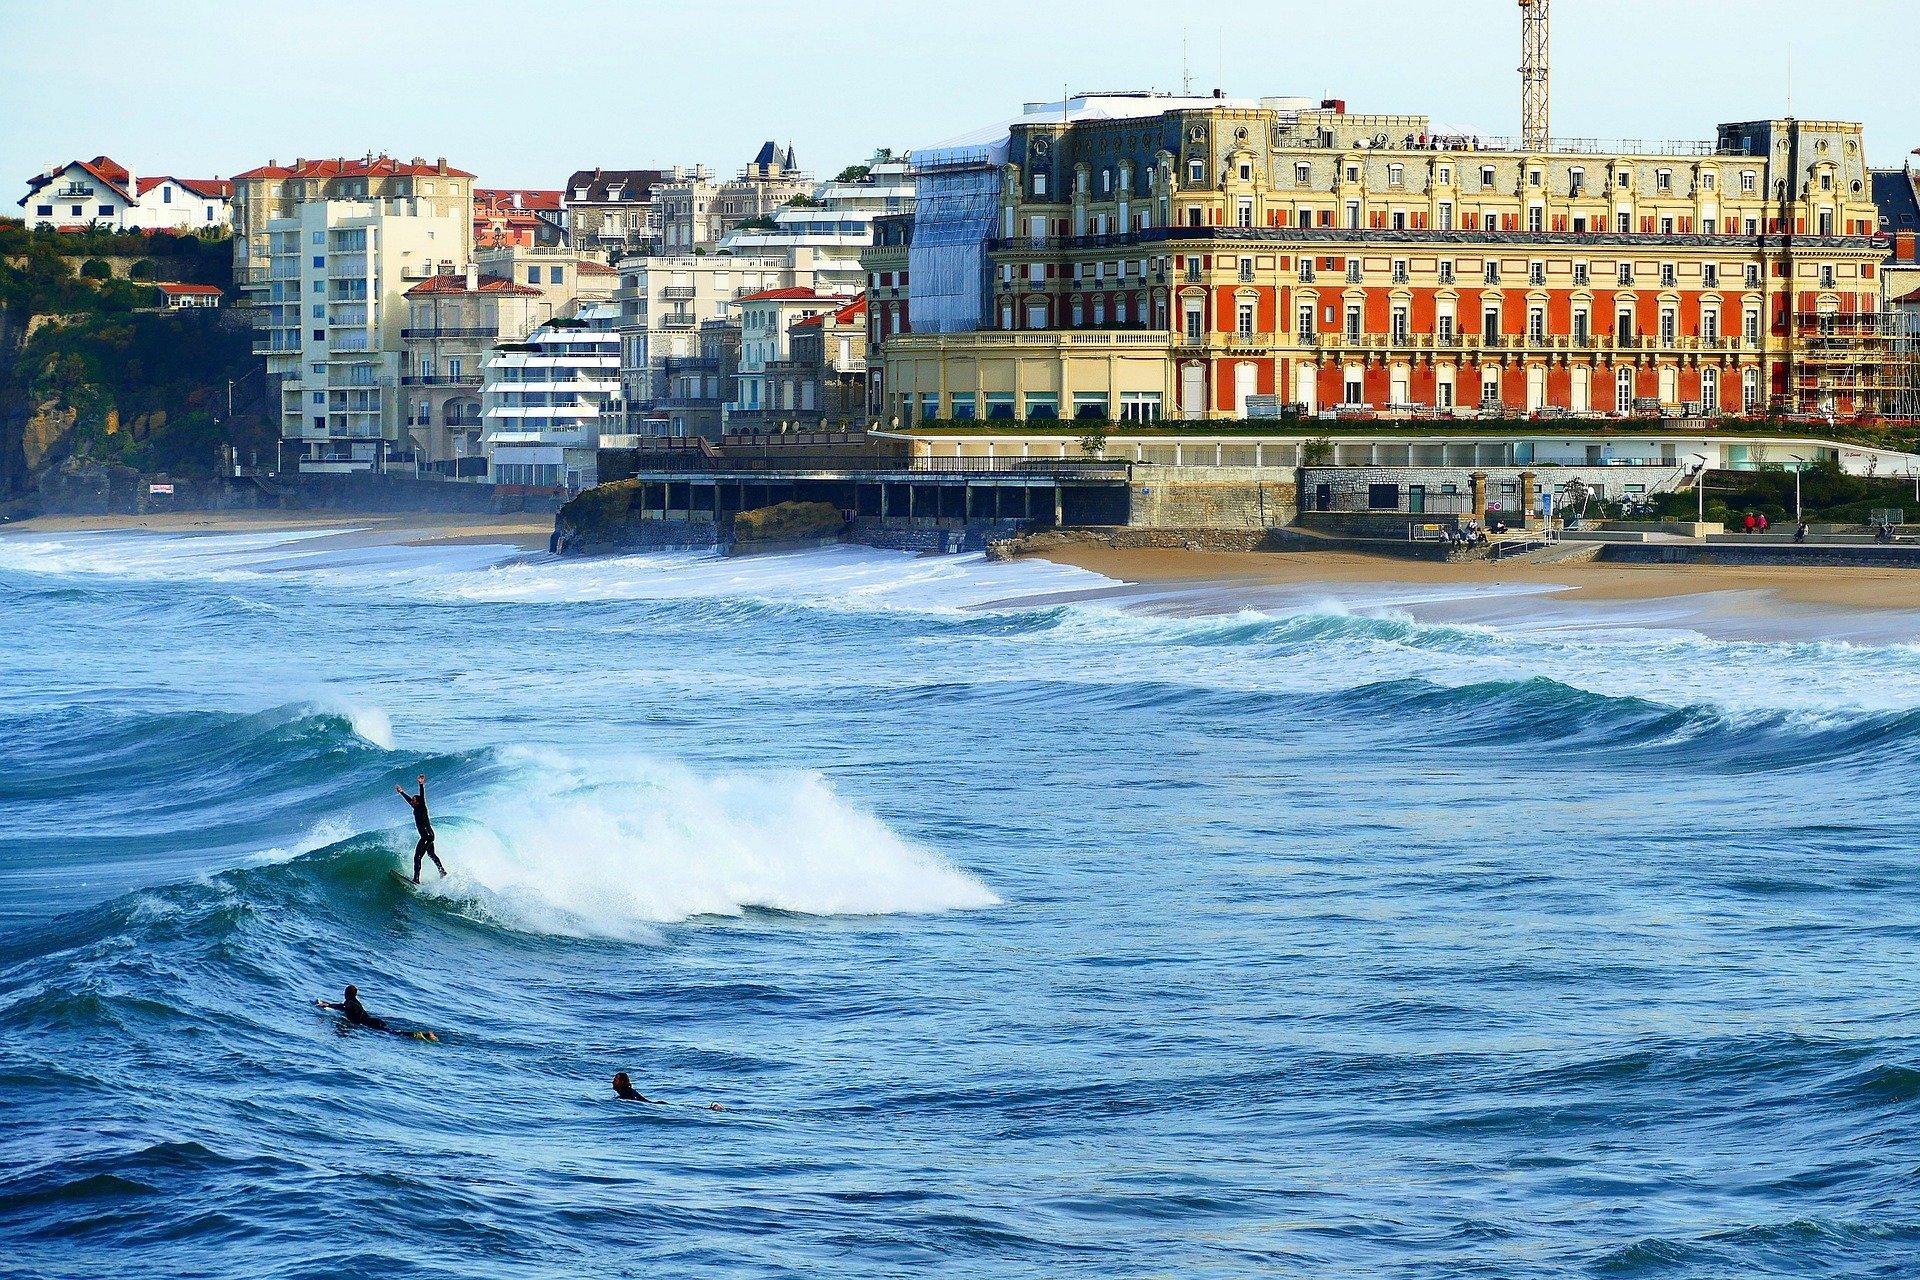 Mer Biarritz